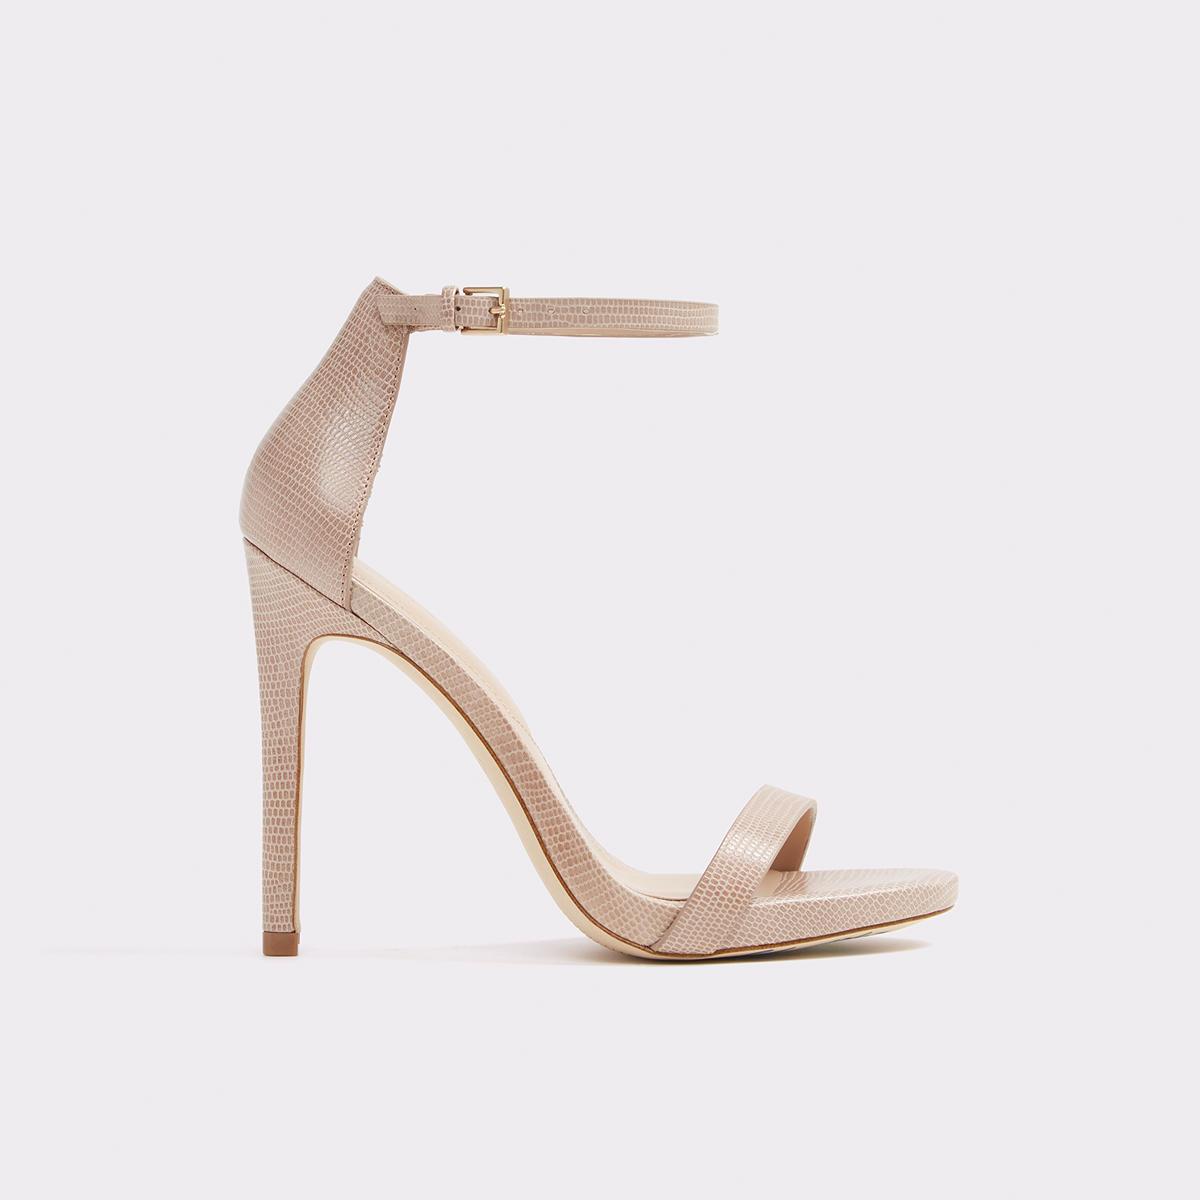 ALDO Caraa Heels Yellow Miscellaneous Womens Footwear Online new sale